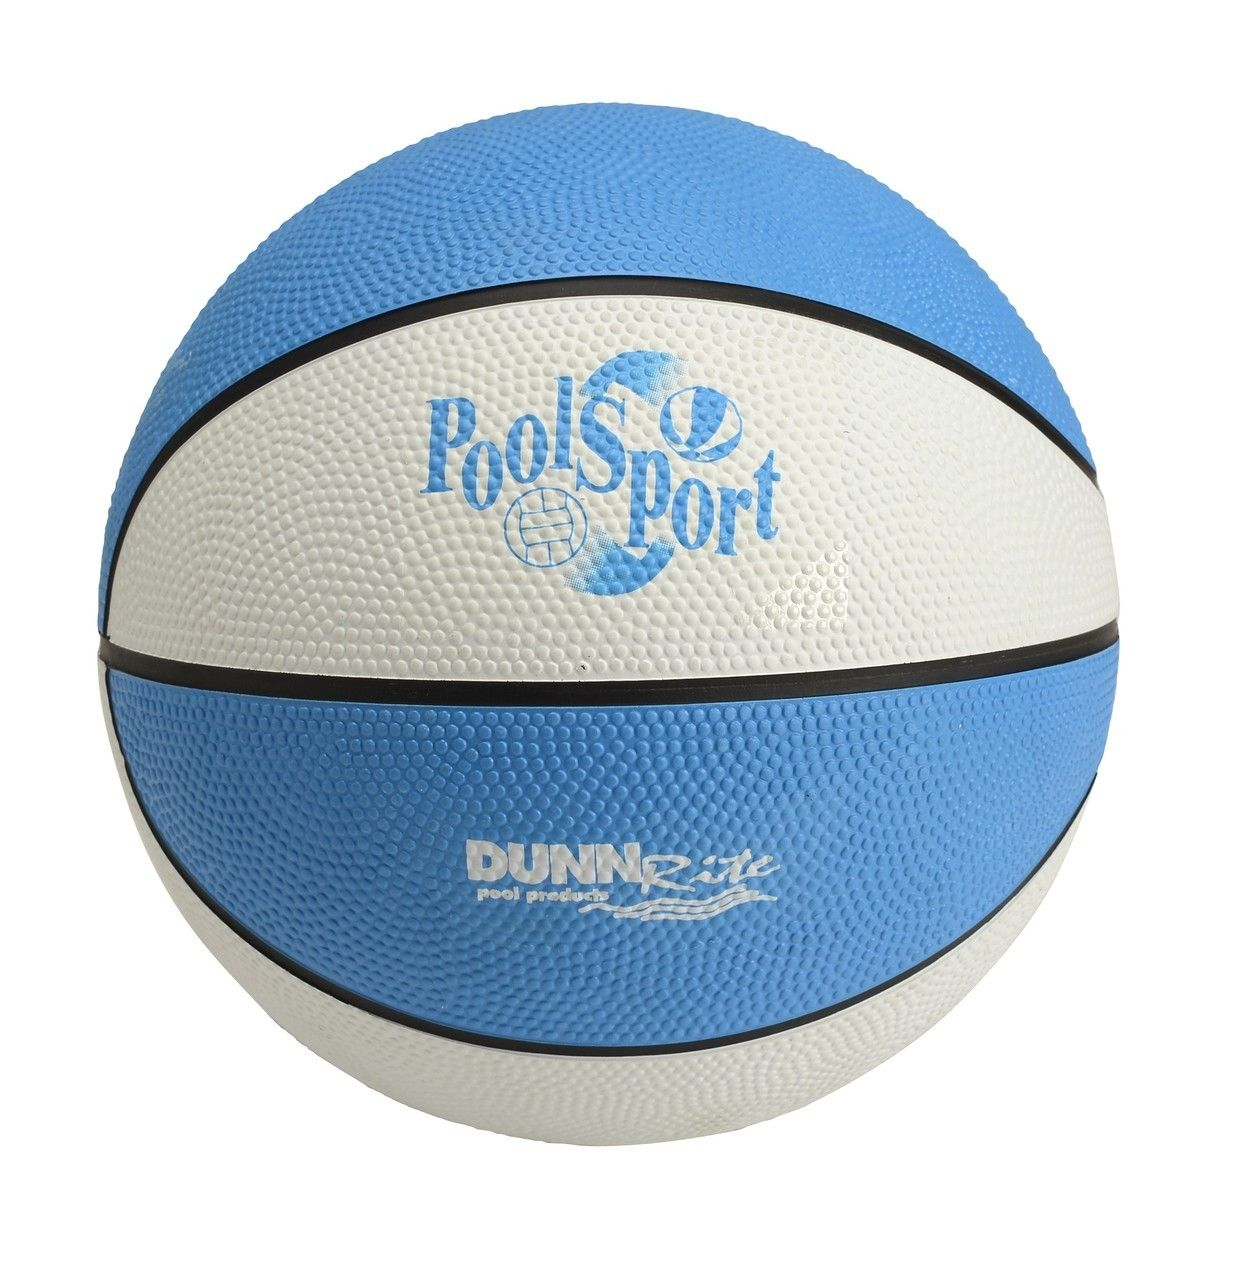 Poolsport Ball 7 3 4 Dia B150 Pool Basketball Mini Swimming Pool Small Pool